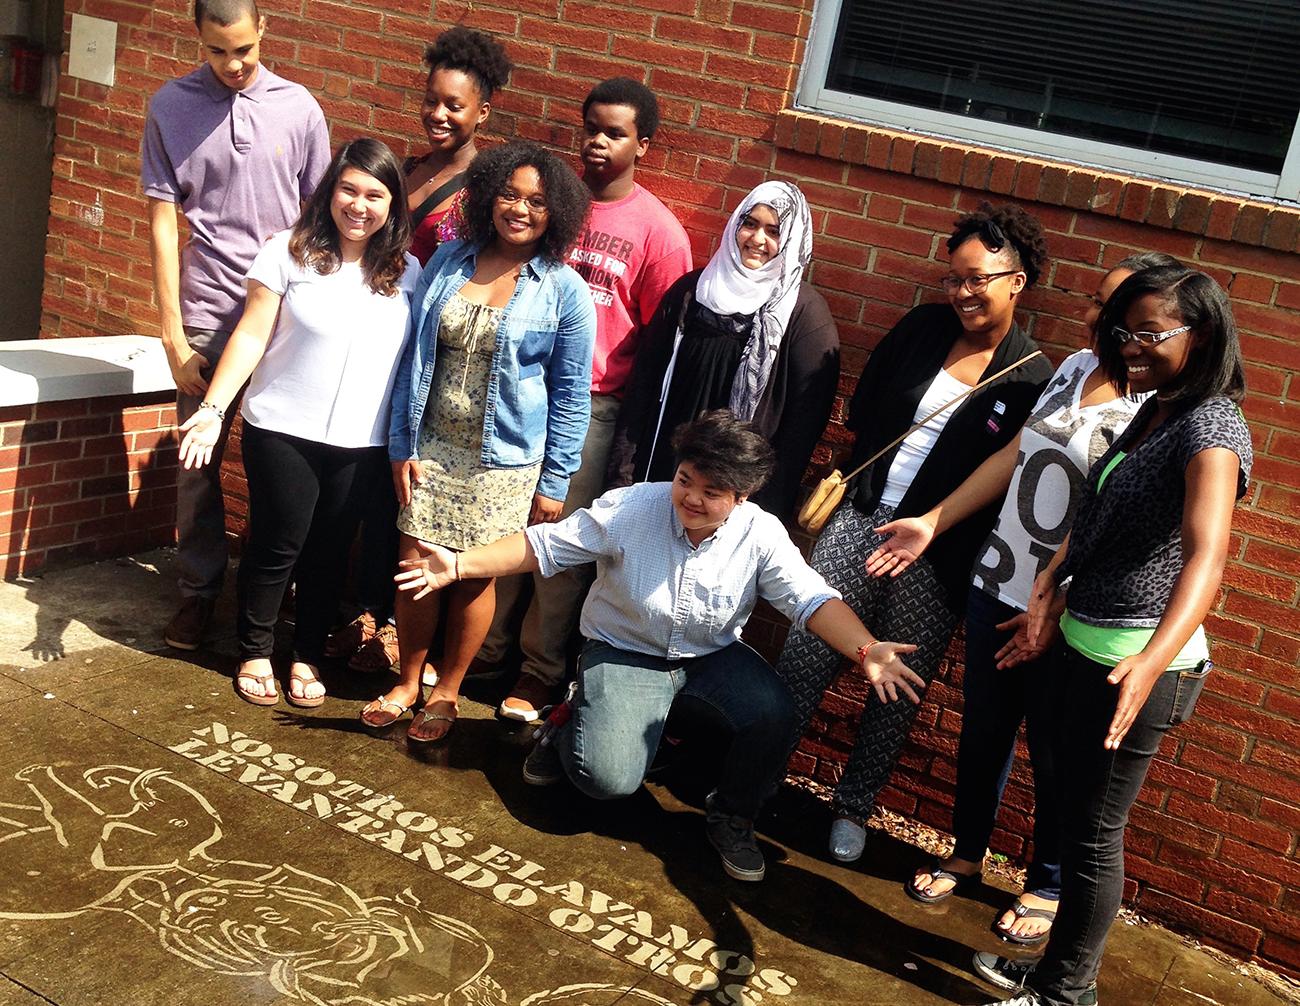 Positivity and partnership:#thesavageway and West Charlotte High School IB art program spread positivity